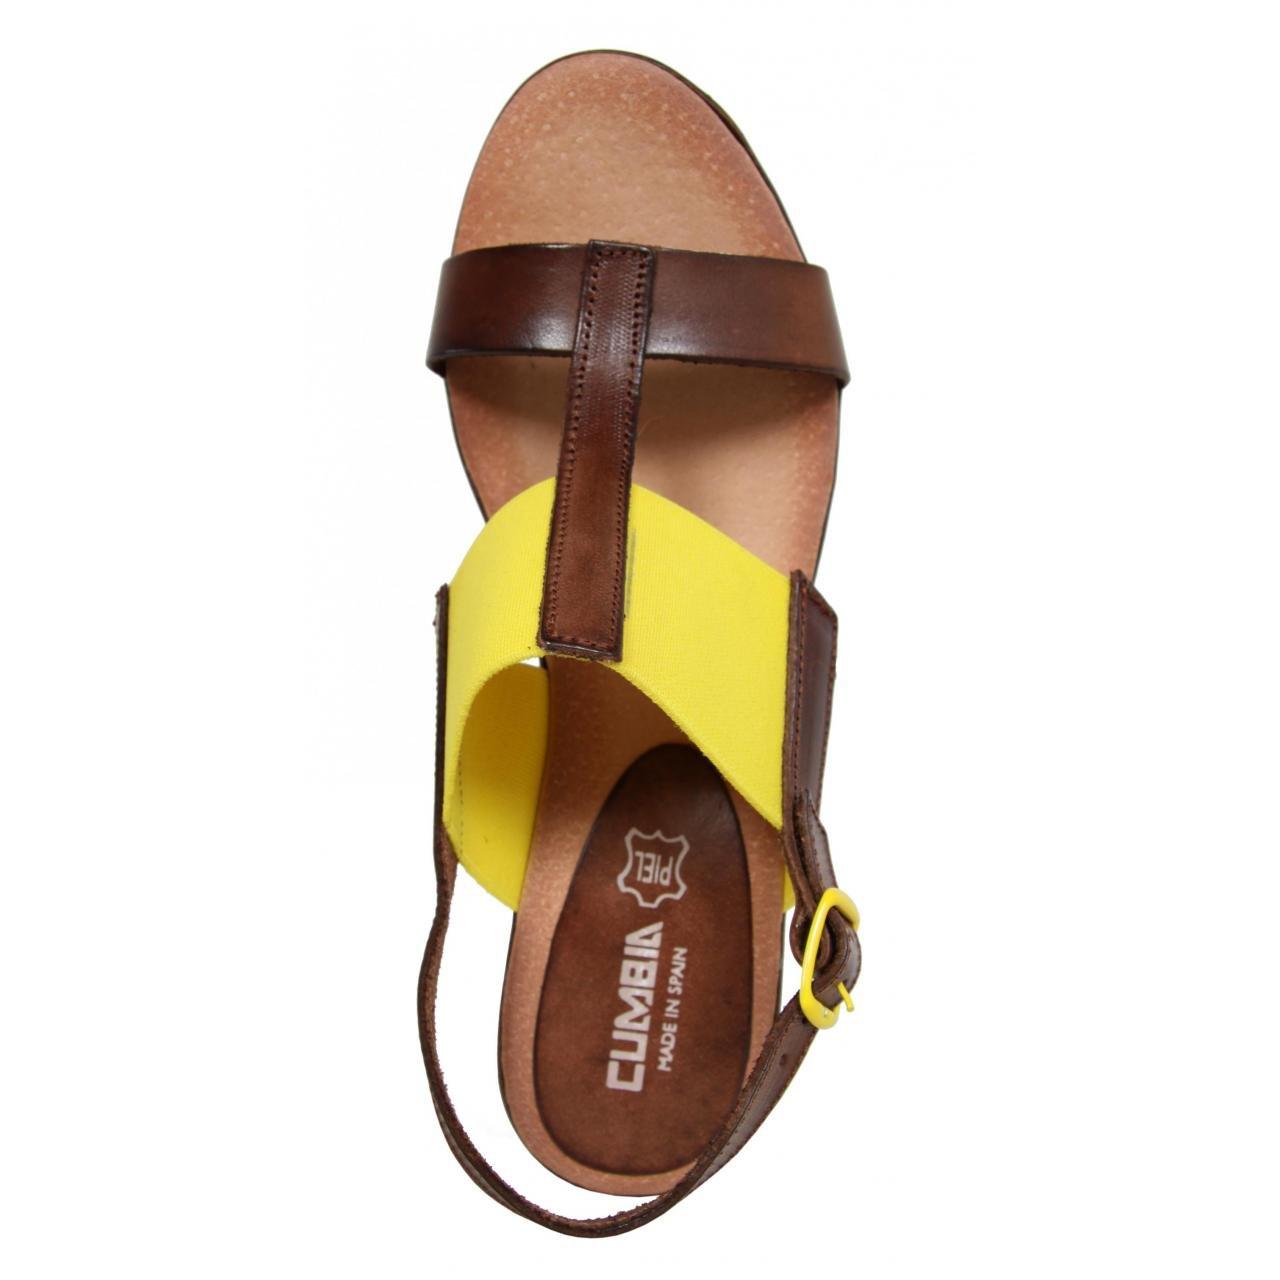 CUMBIA CUMBIA CUMBIA Schuhe Keilabsatz für Damen 30126 NUEZ-Amarillo - f89406